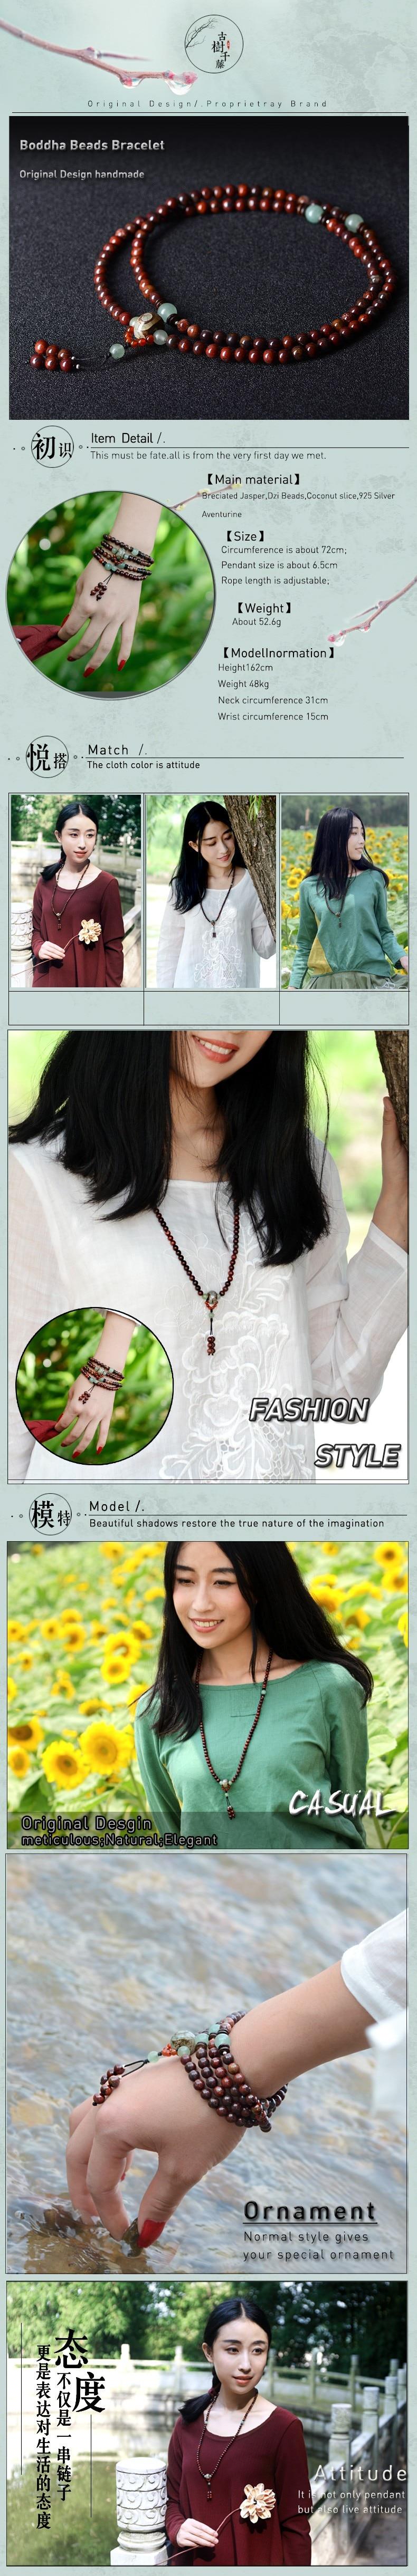 Beaded Bracelet vintage Dzi Beads pendant Bohhda Necklace natural stone handmade jewelry wrap charm Bracelets for women 19 3